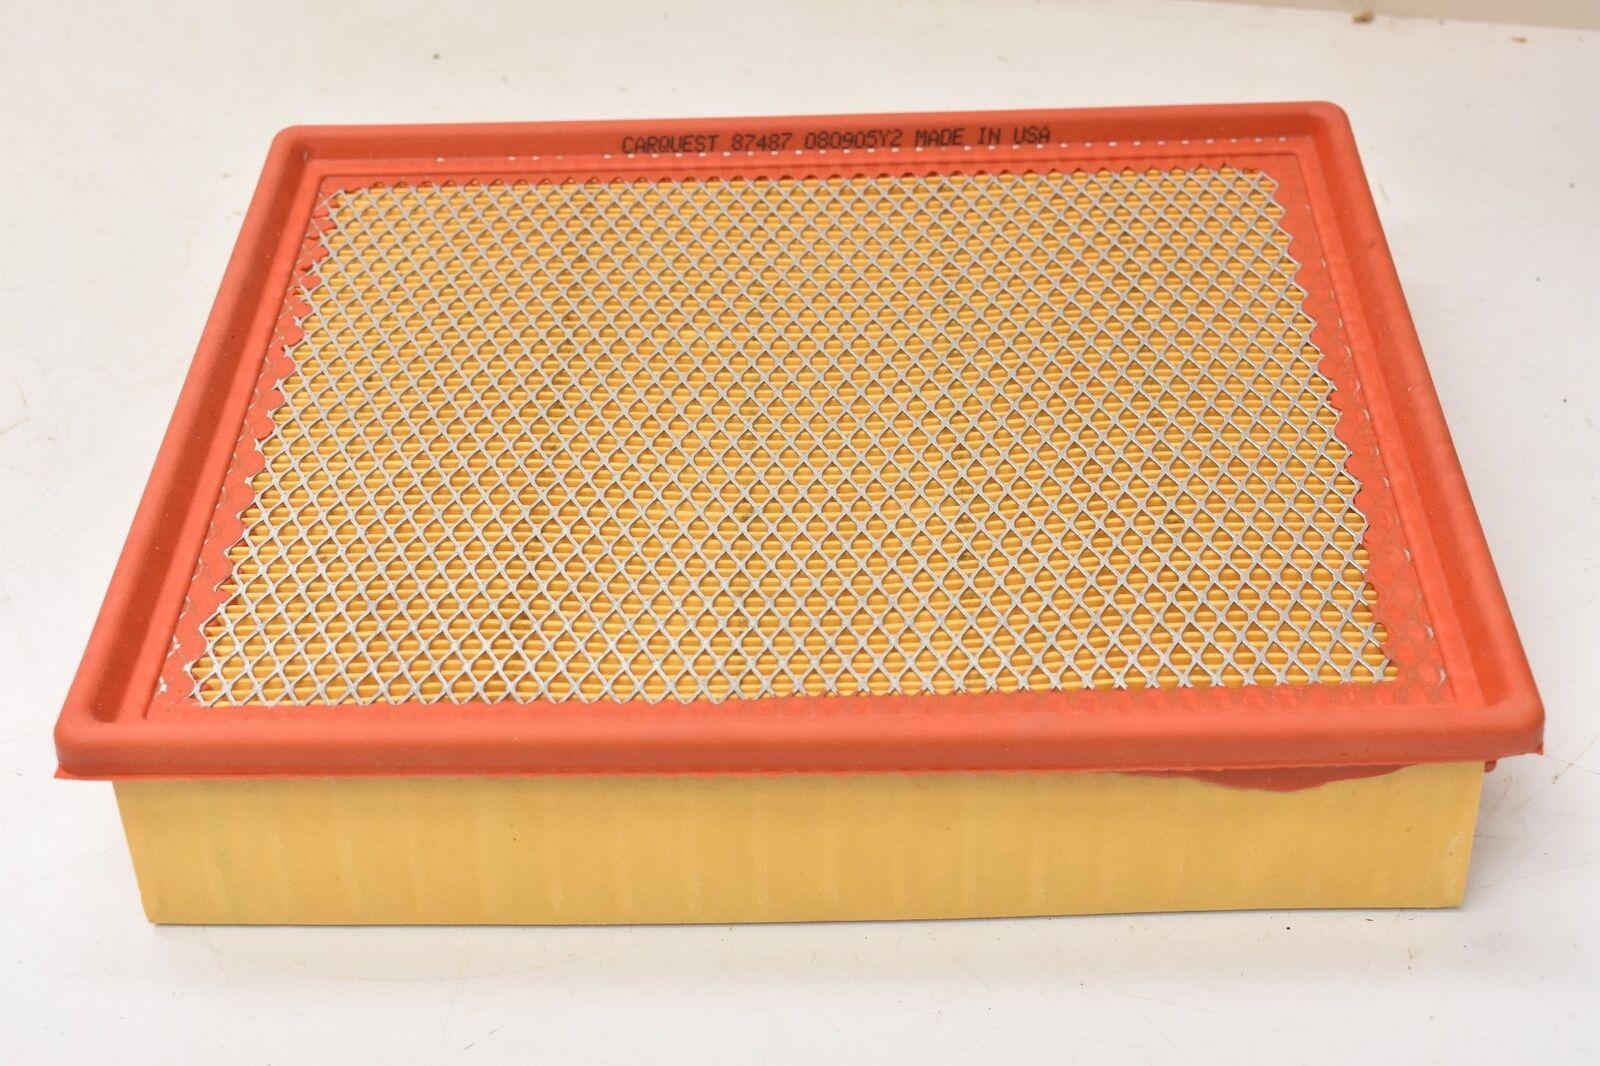 Carquest 87487 Premium Air Filter For Sale Online Ebay